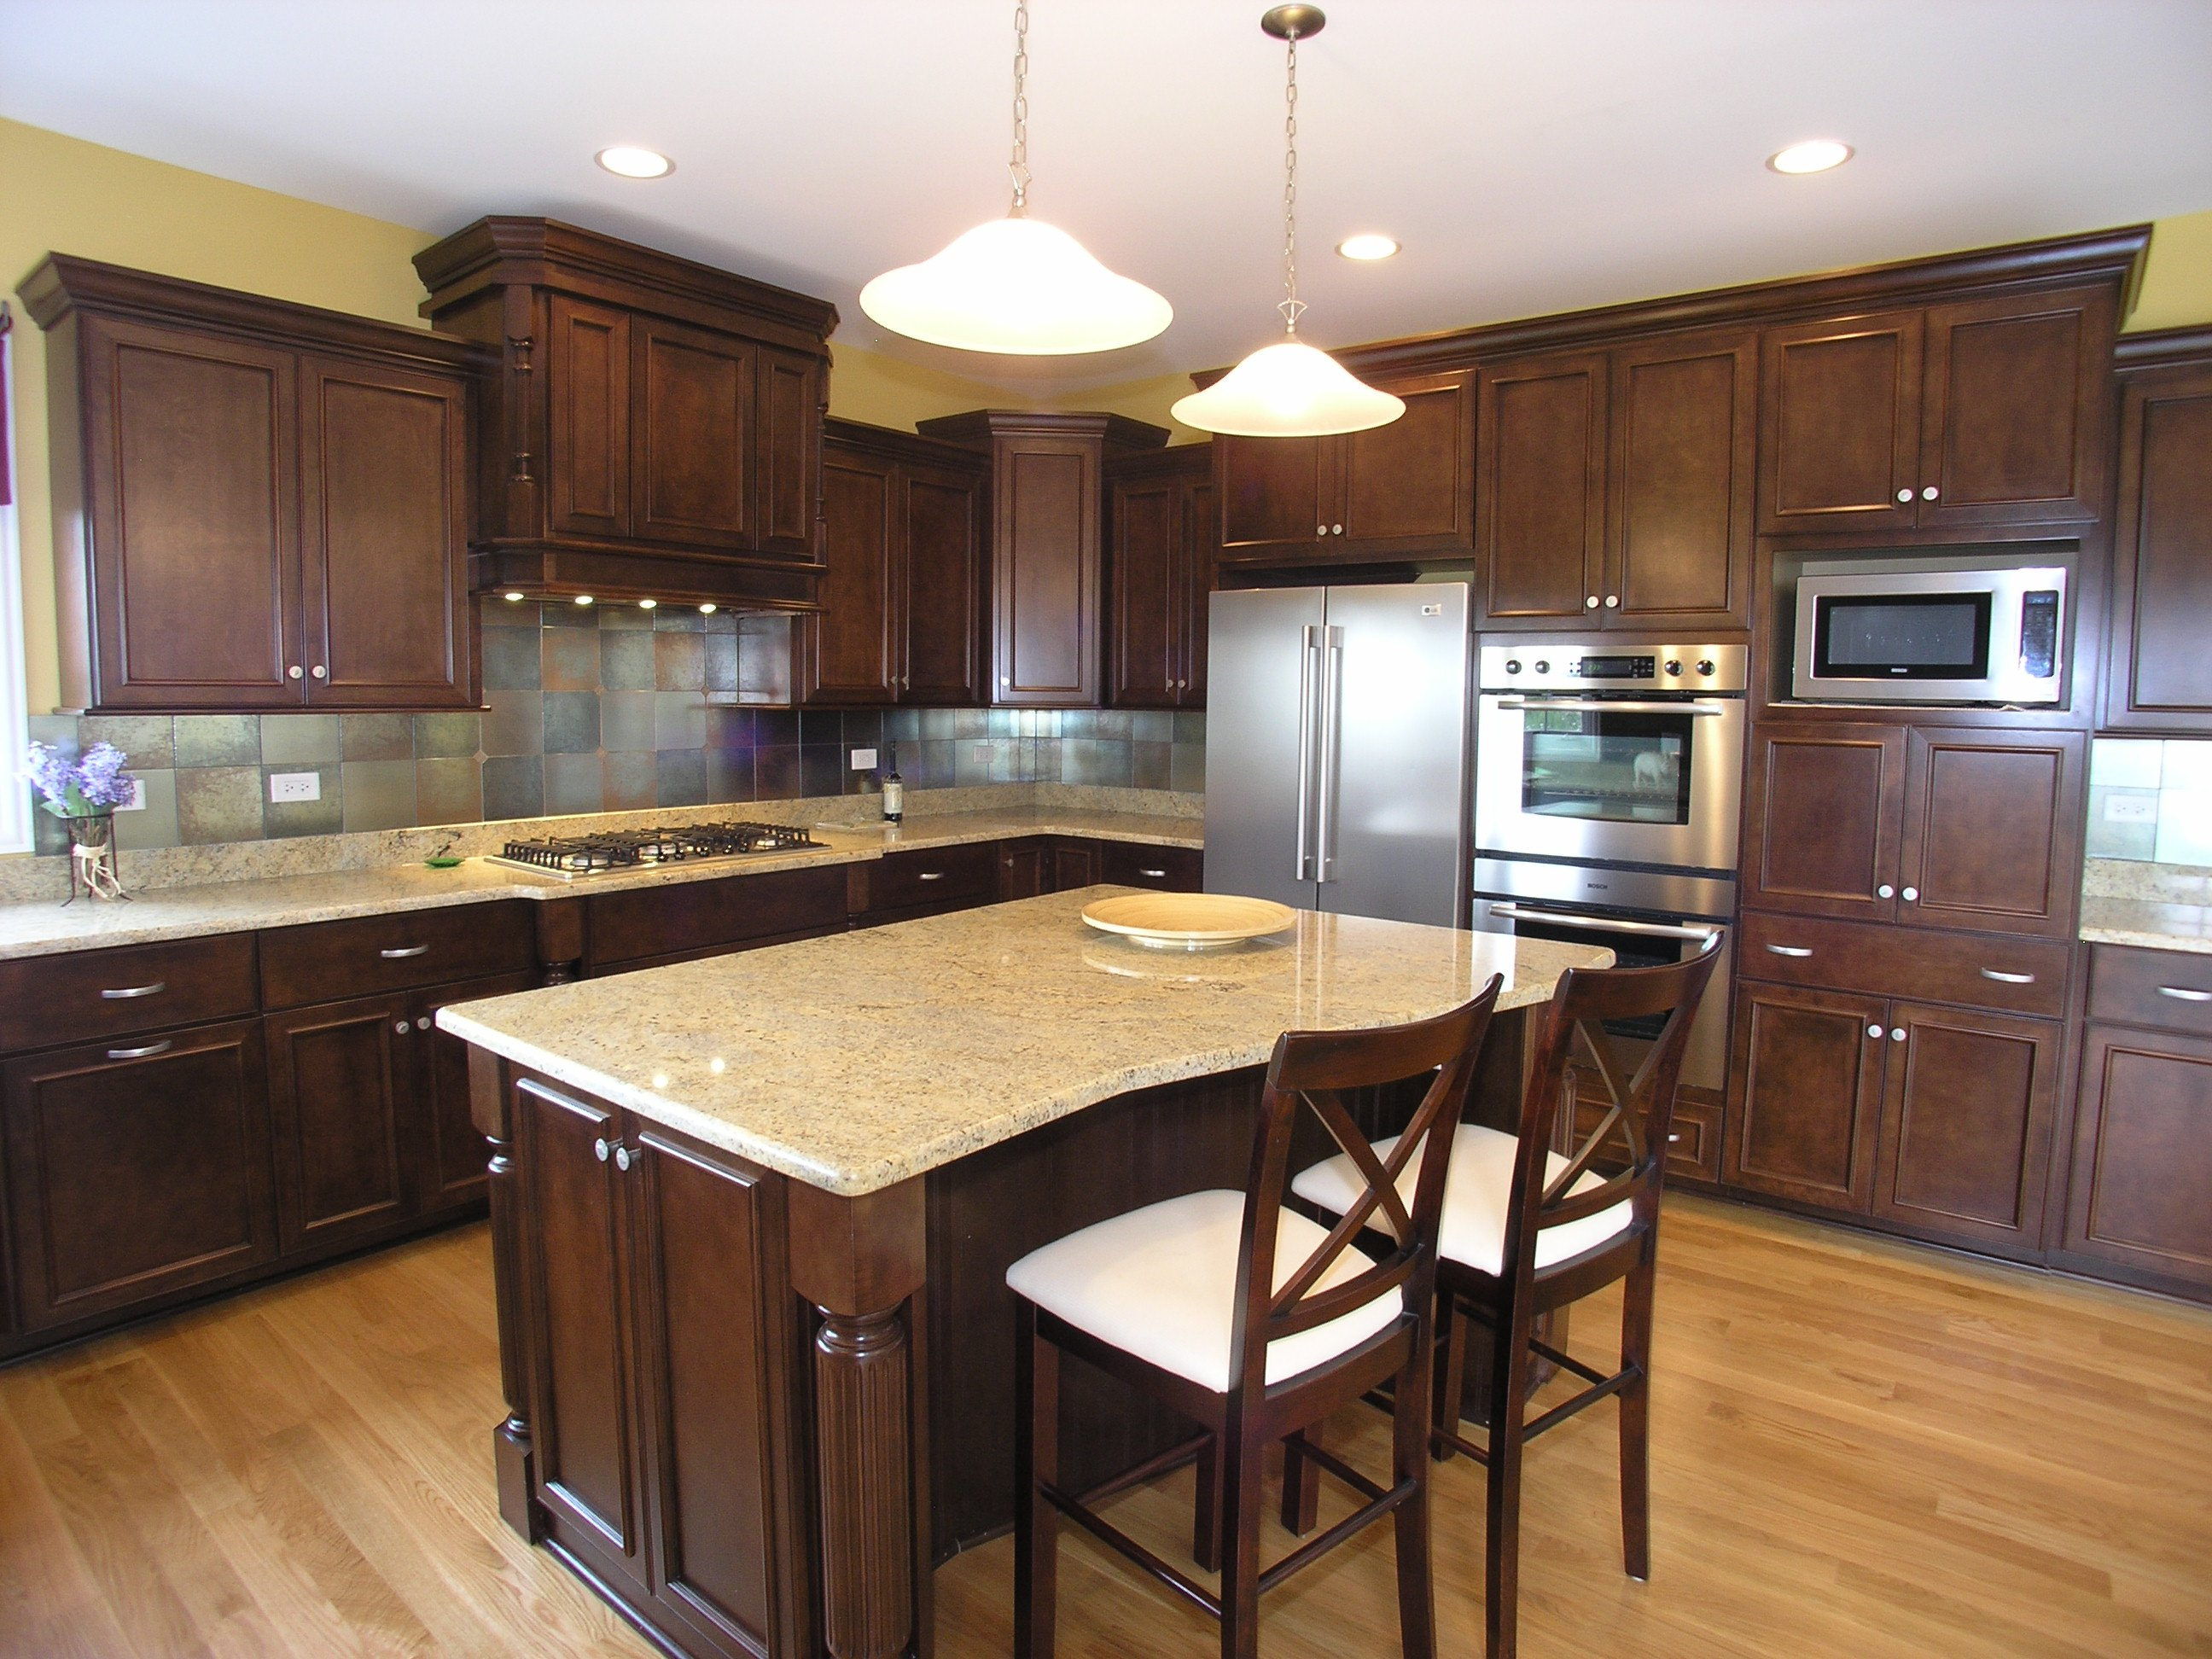 051 Granite Kashmir White Kitchen Dark Cabinets Stone Island Neutral